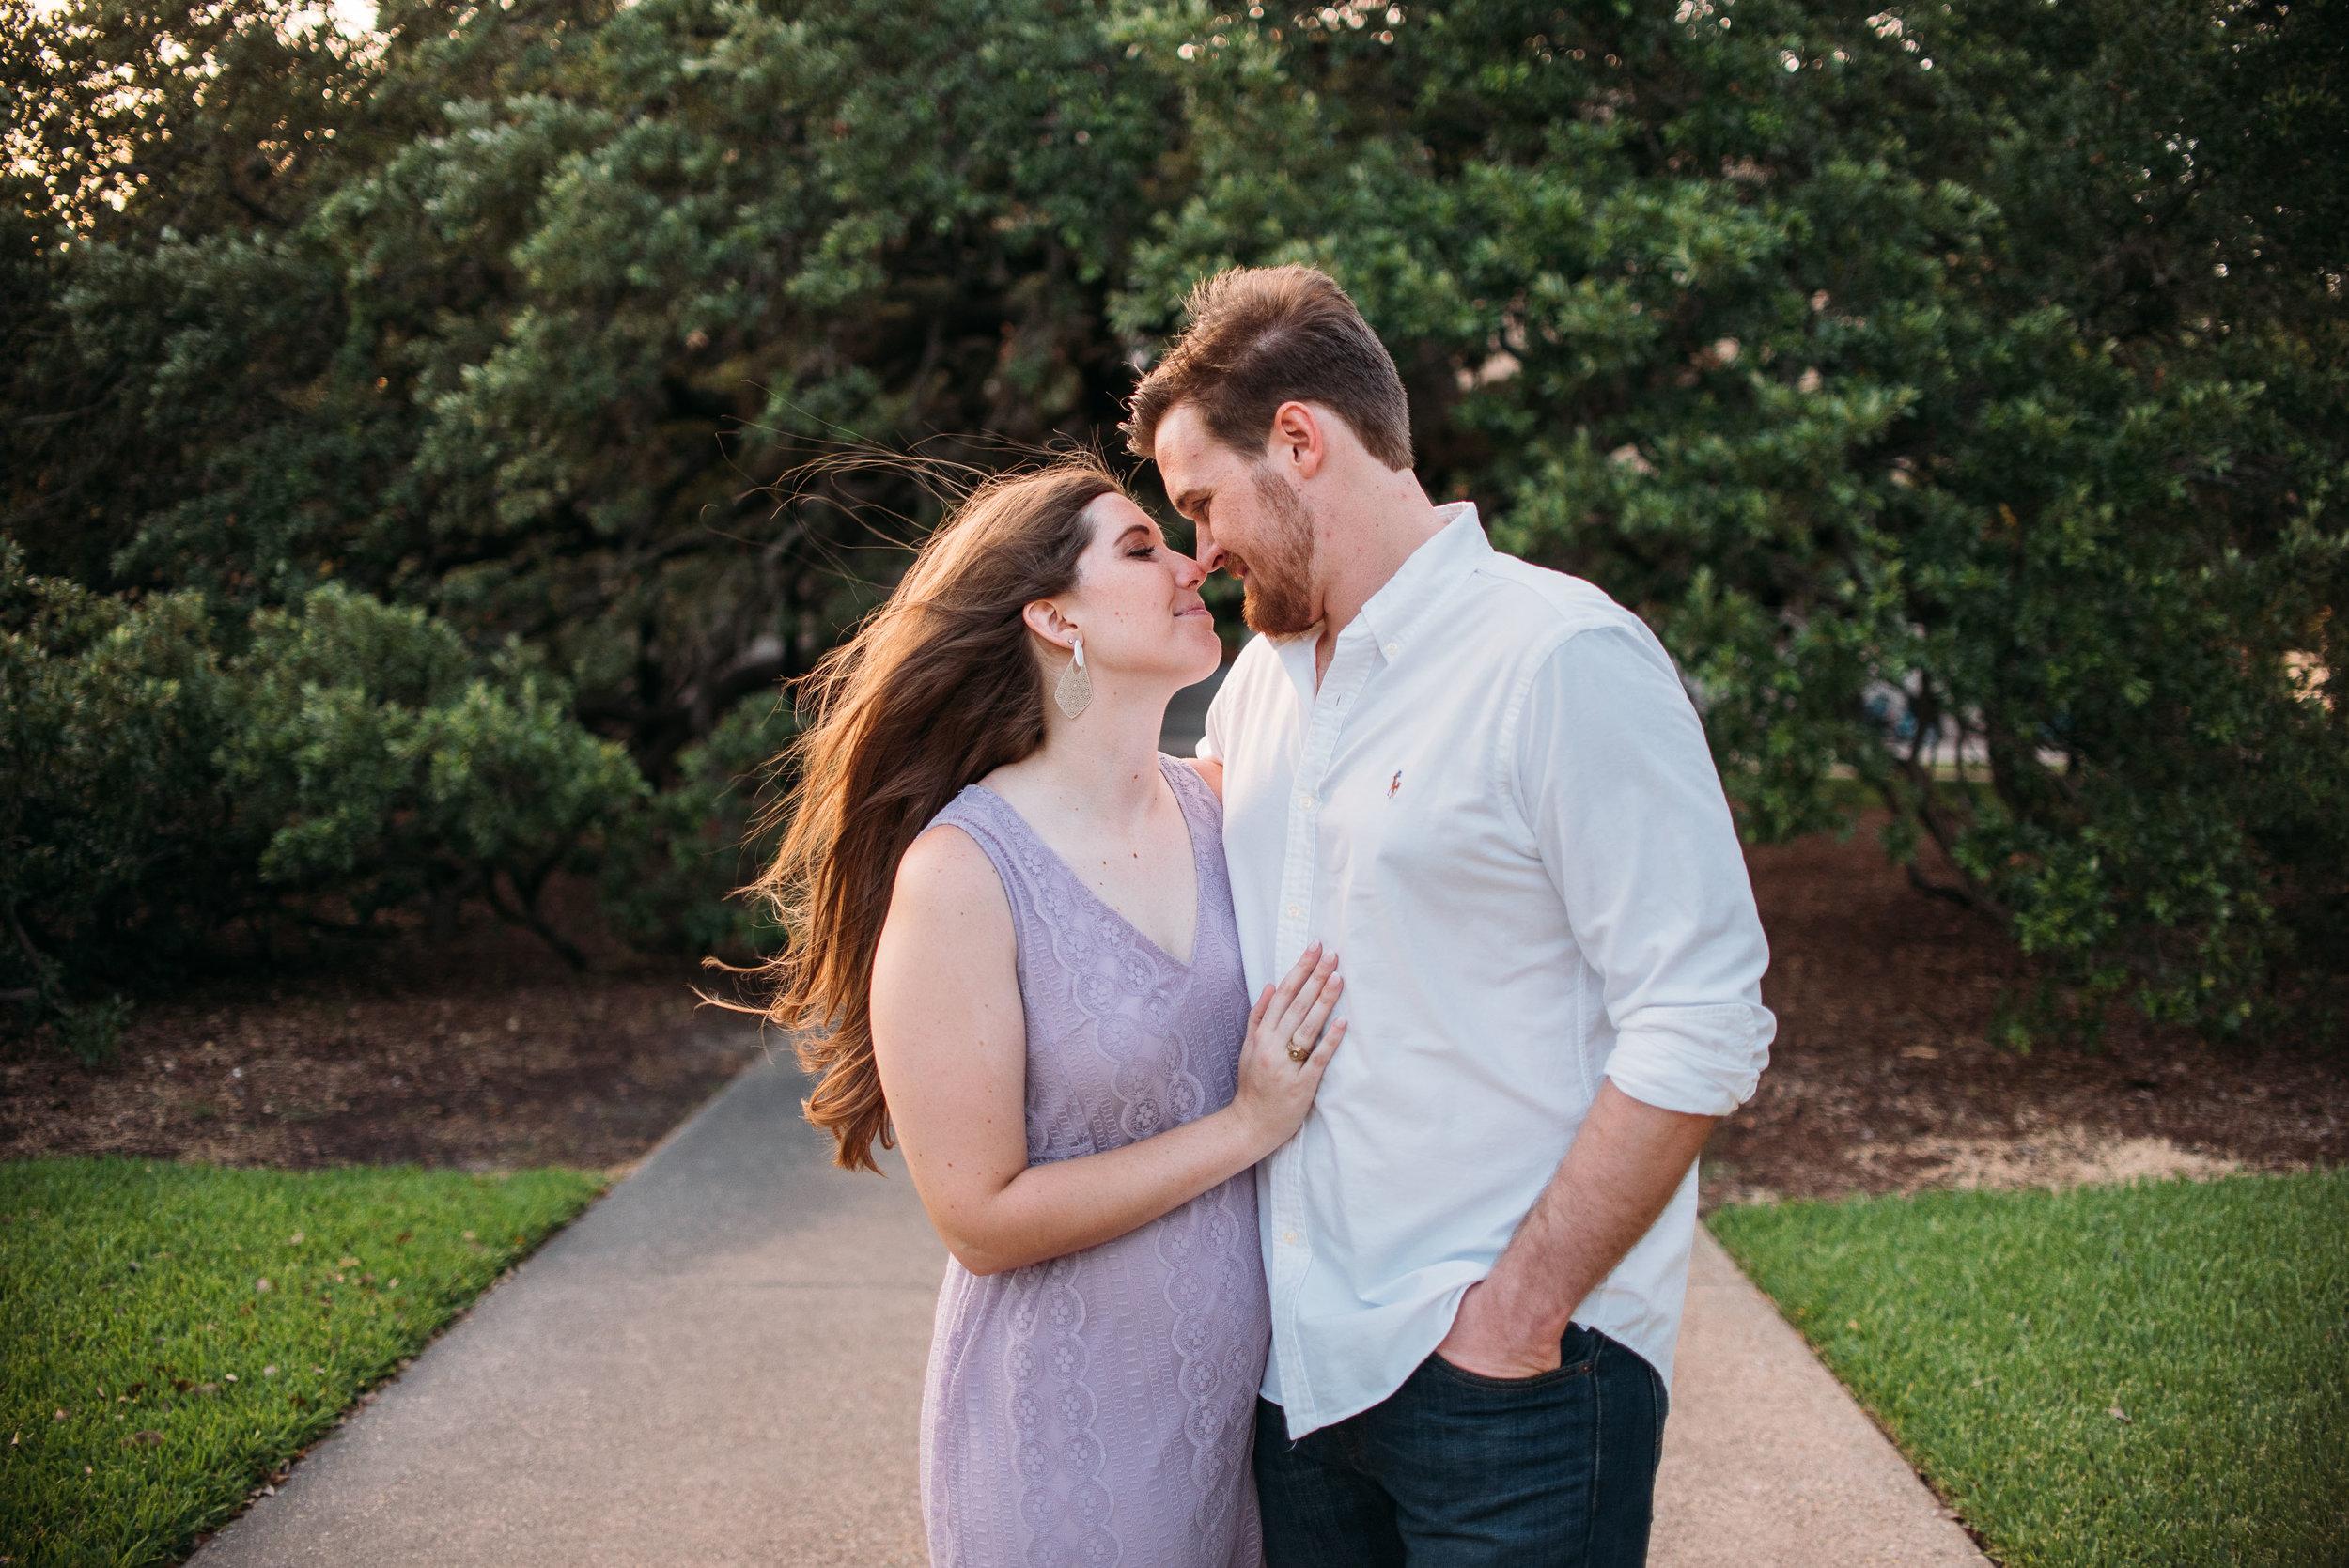 Texas-A&M-University-Engagement-College-Station-Wedding-Photographer-San-Angel-Photo-Mark-Johanna-Century-Tree-26.jpg